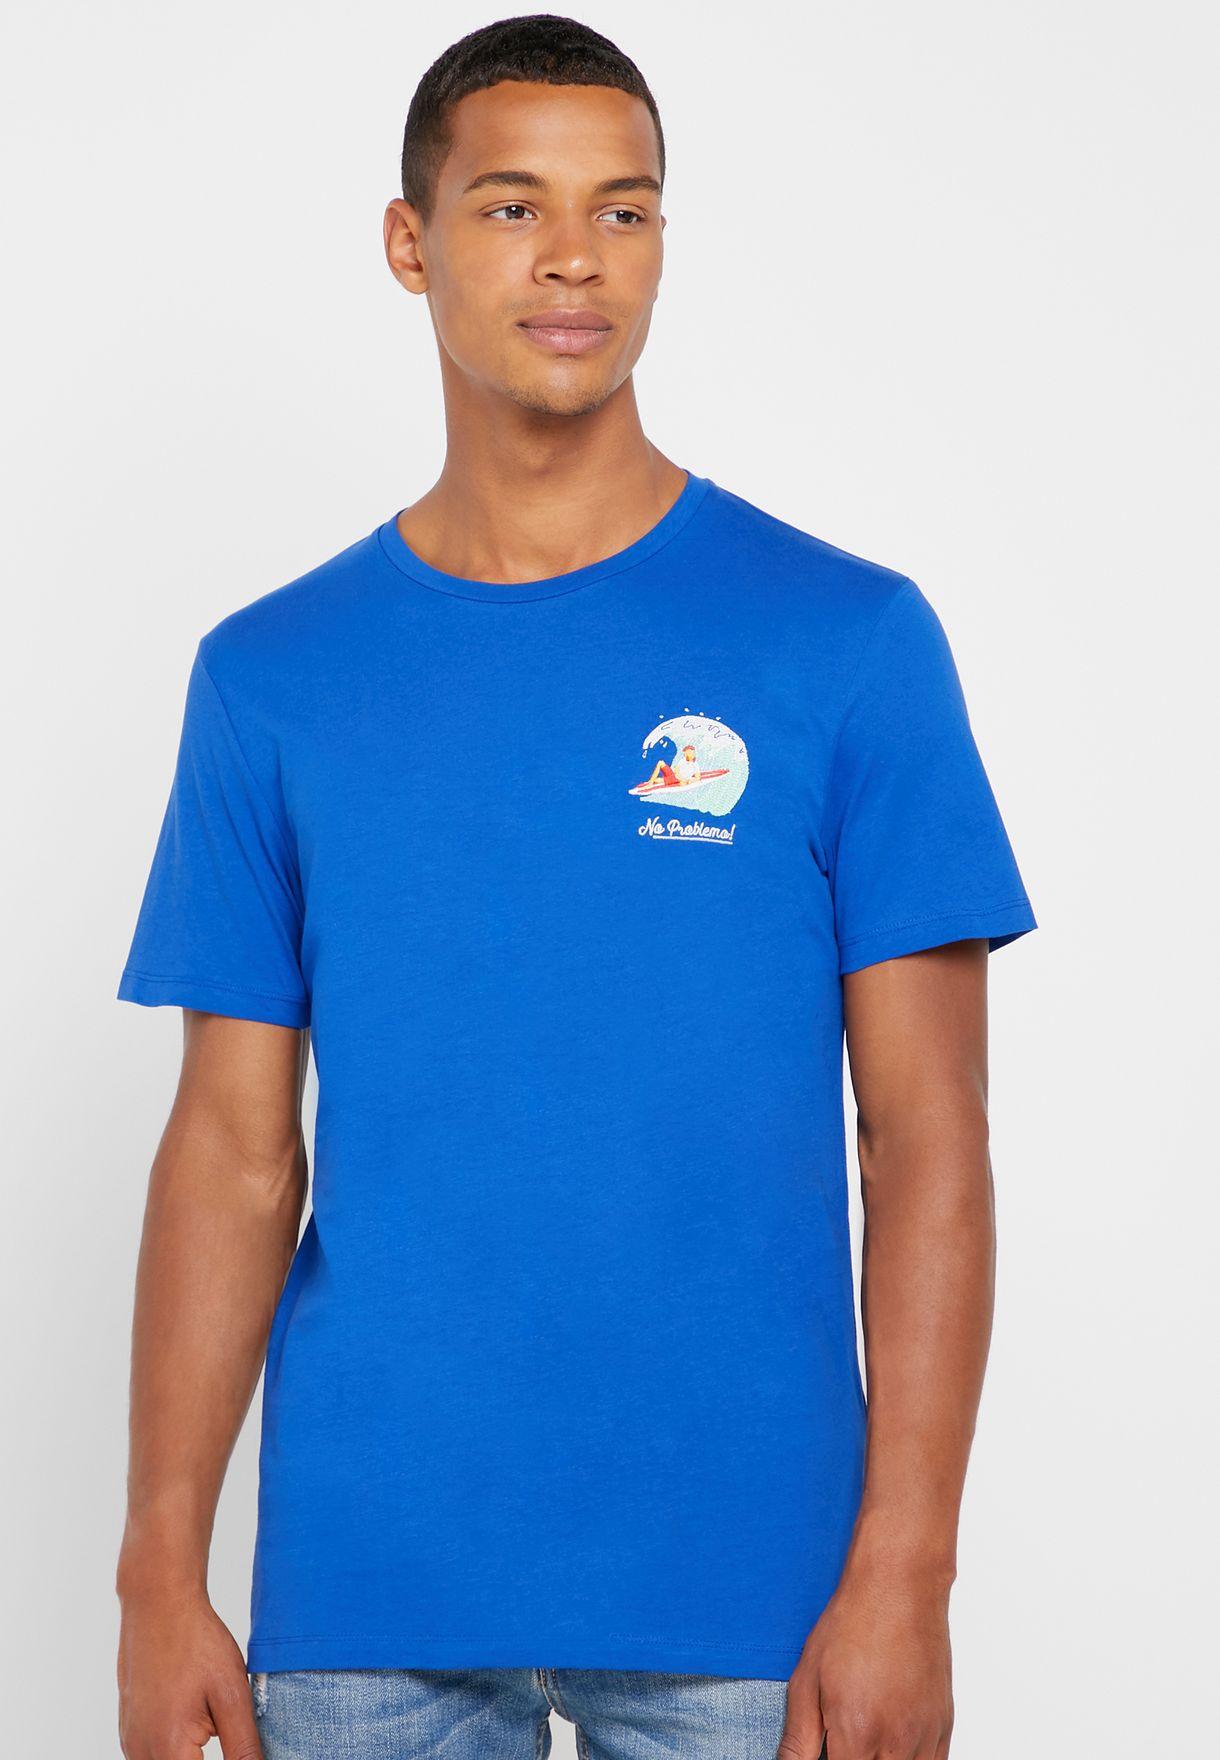 No Problemo Print Crew Neck T-Shirt